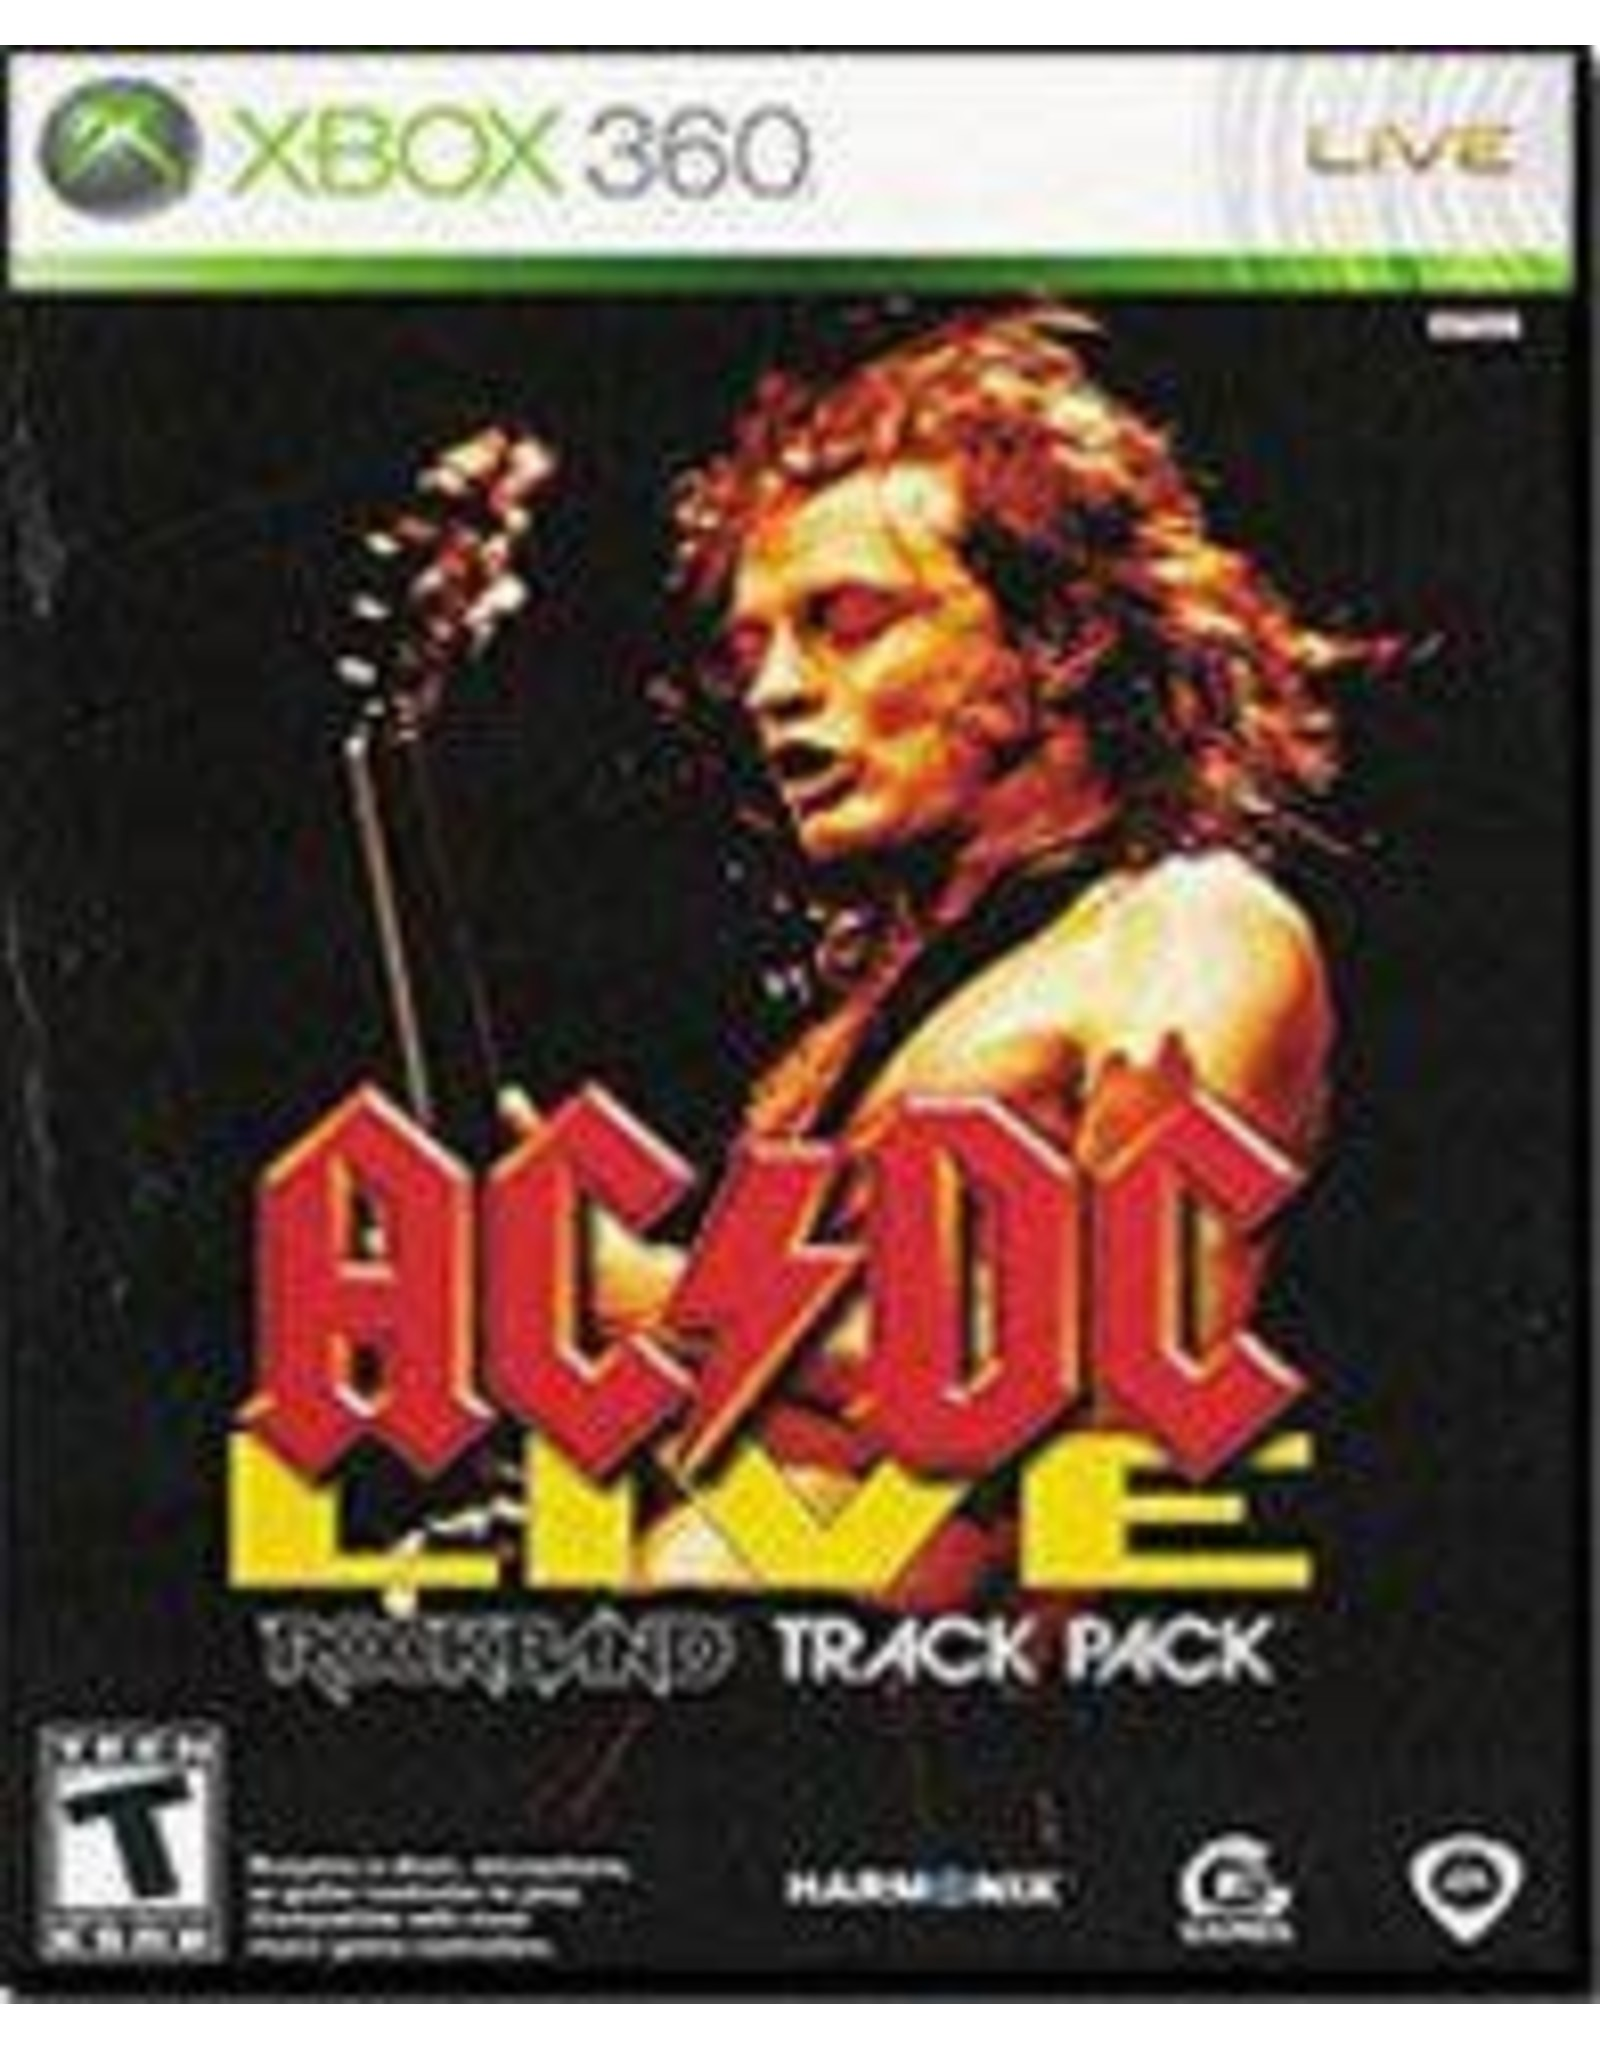 Xbox 360 AC/DC Live Rock Band Track Pack (CiB)